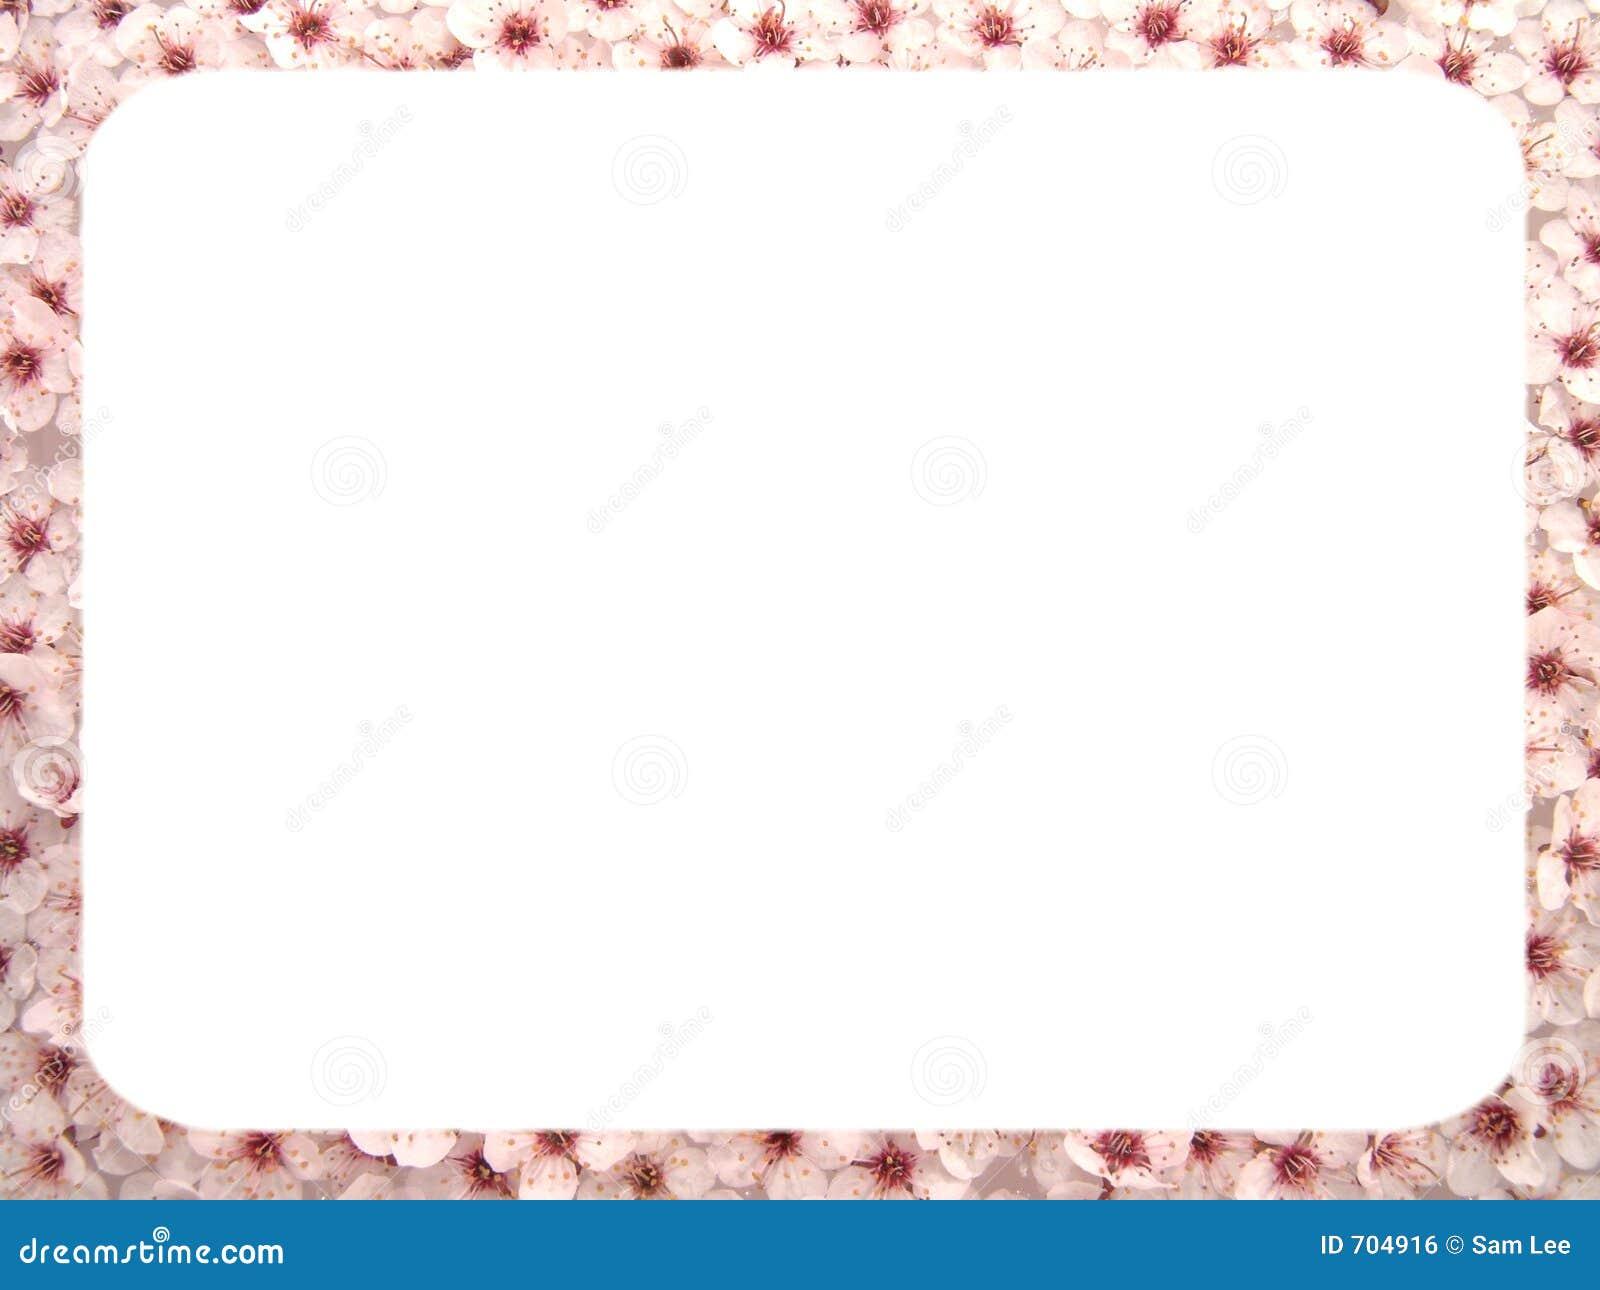 plum flowers frame i royalty free stock image